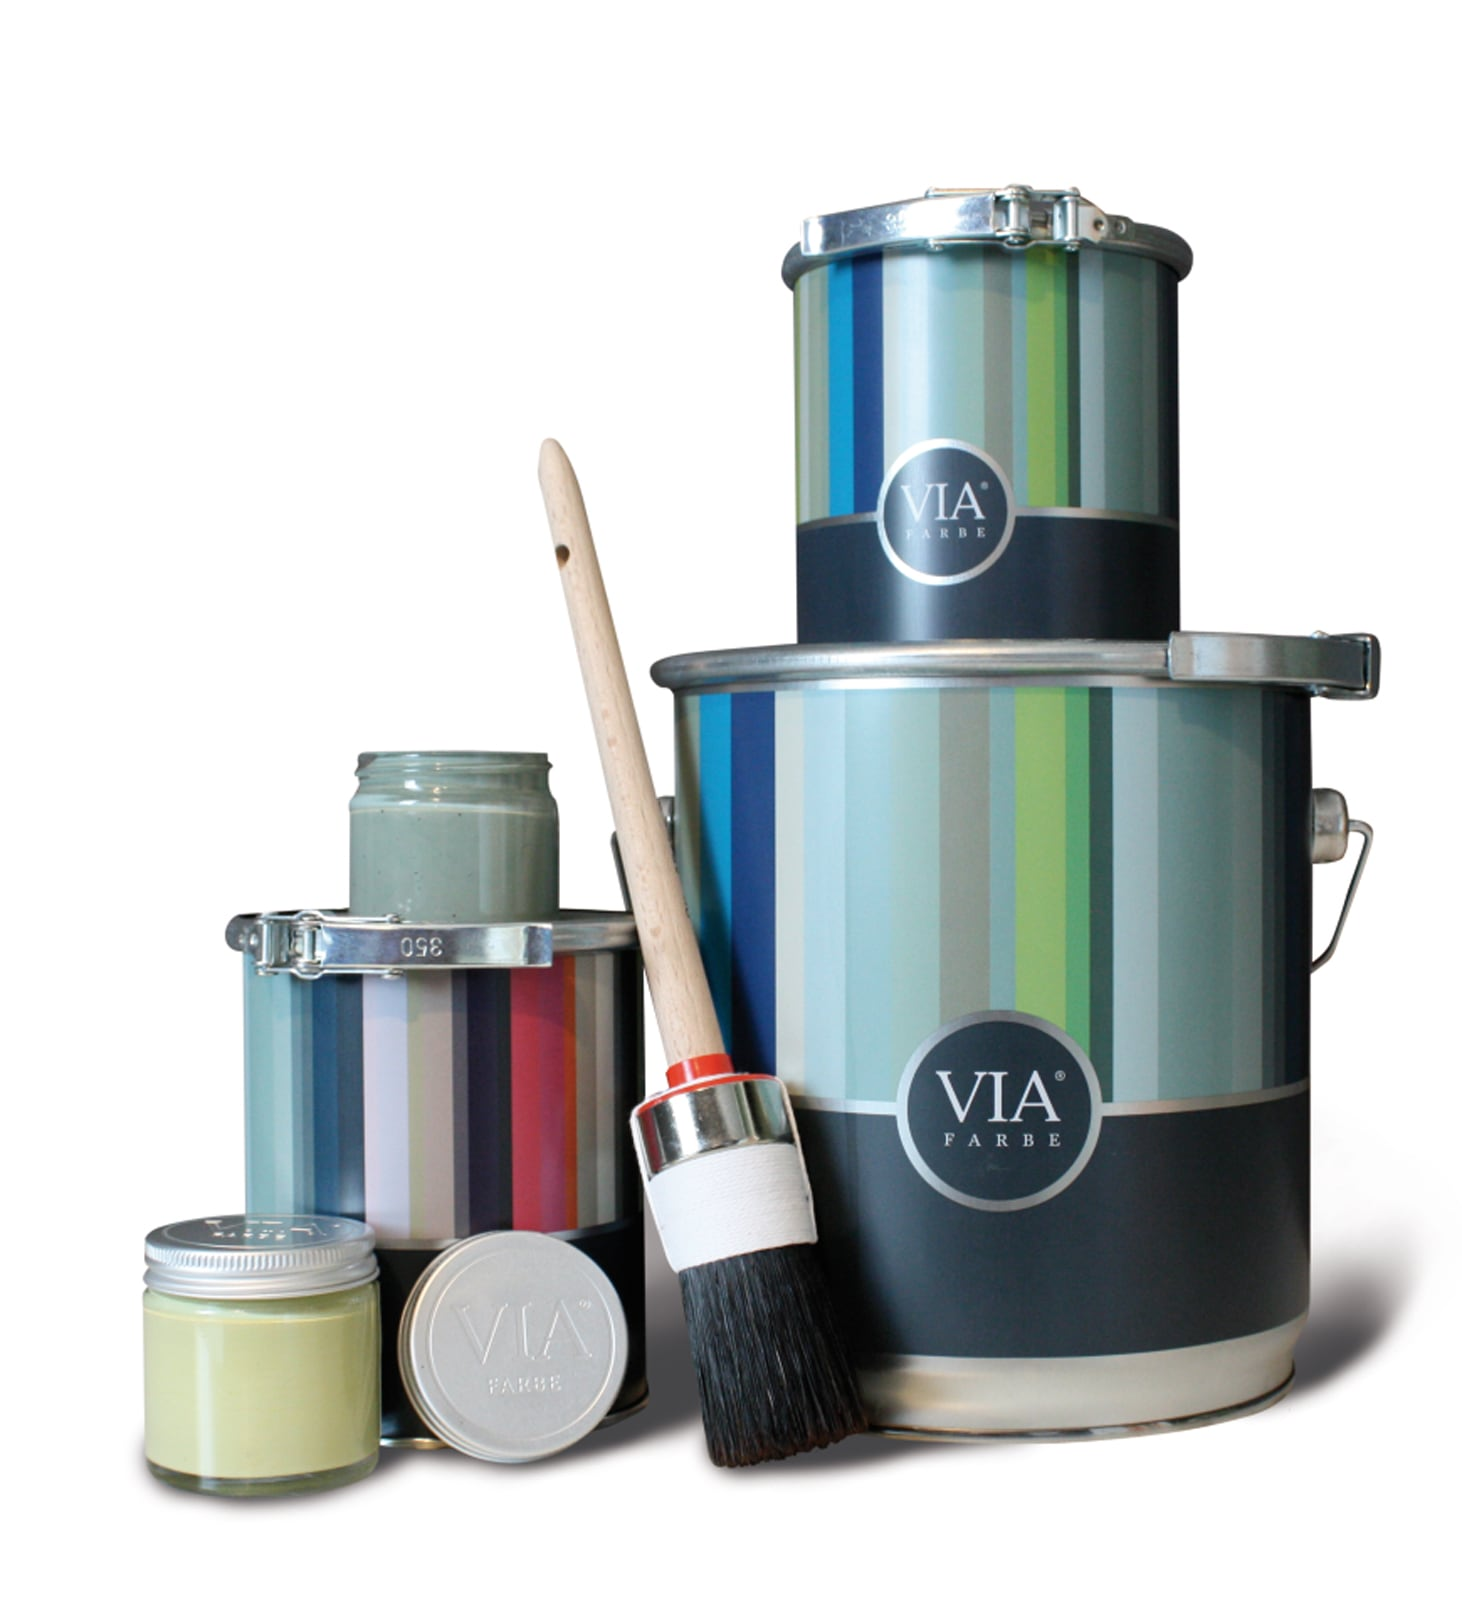 VIA-Kreidefarbe-Farbeimer-Gläschen